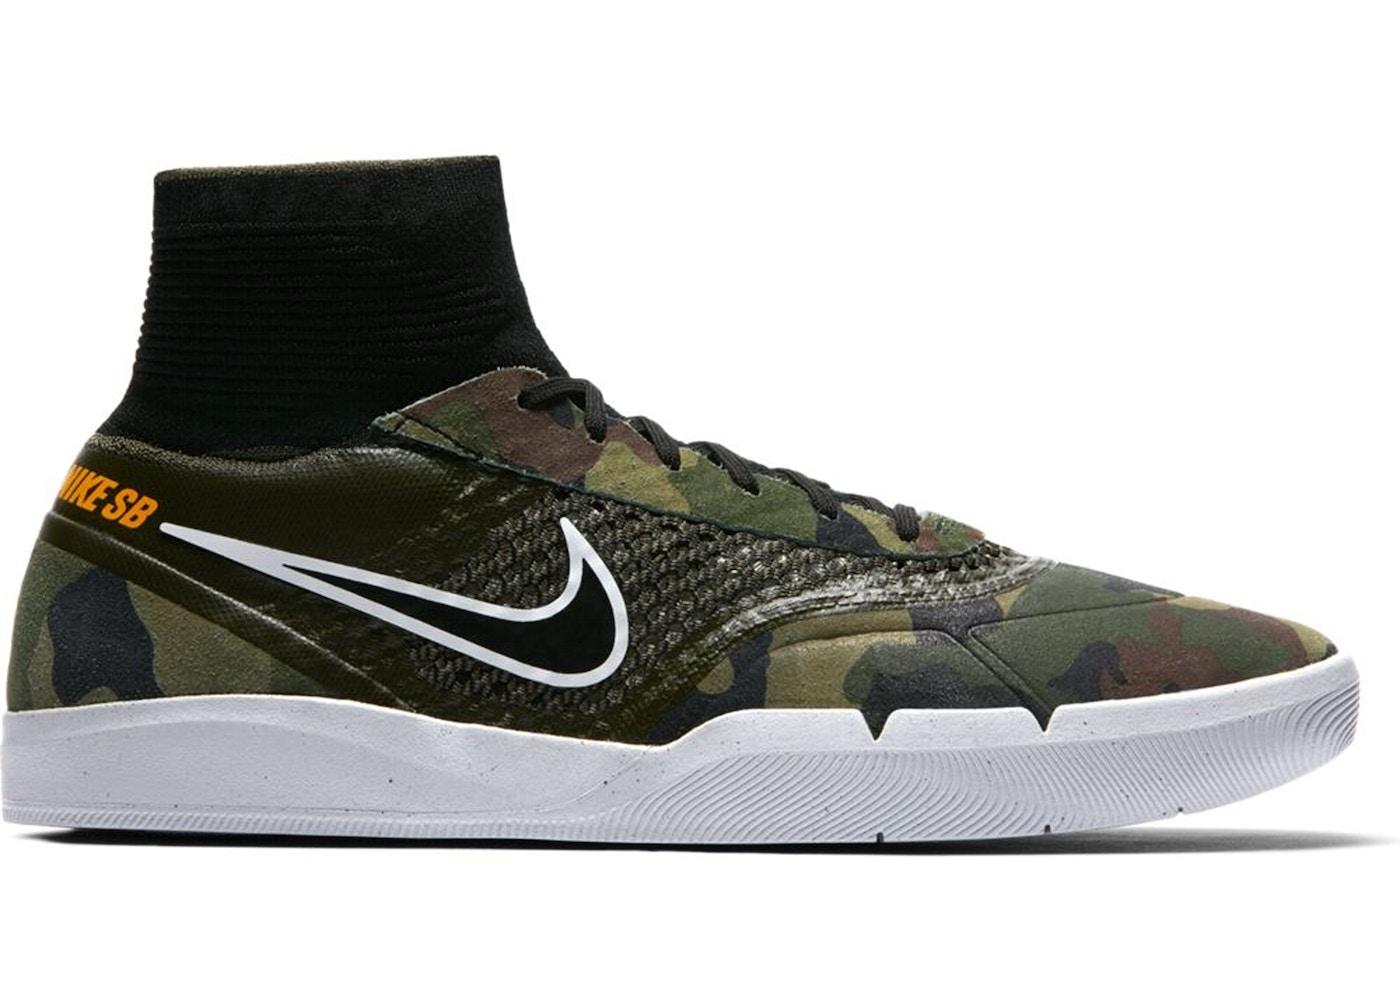 bffb1e6f3b38 Nike SB Hyperfeel Koston 3 Camo - 819673-381